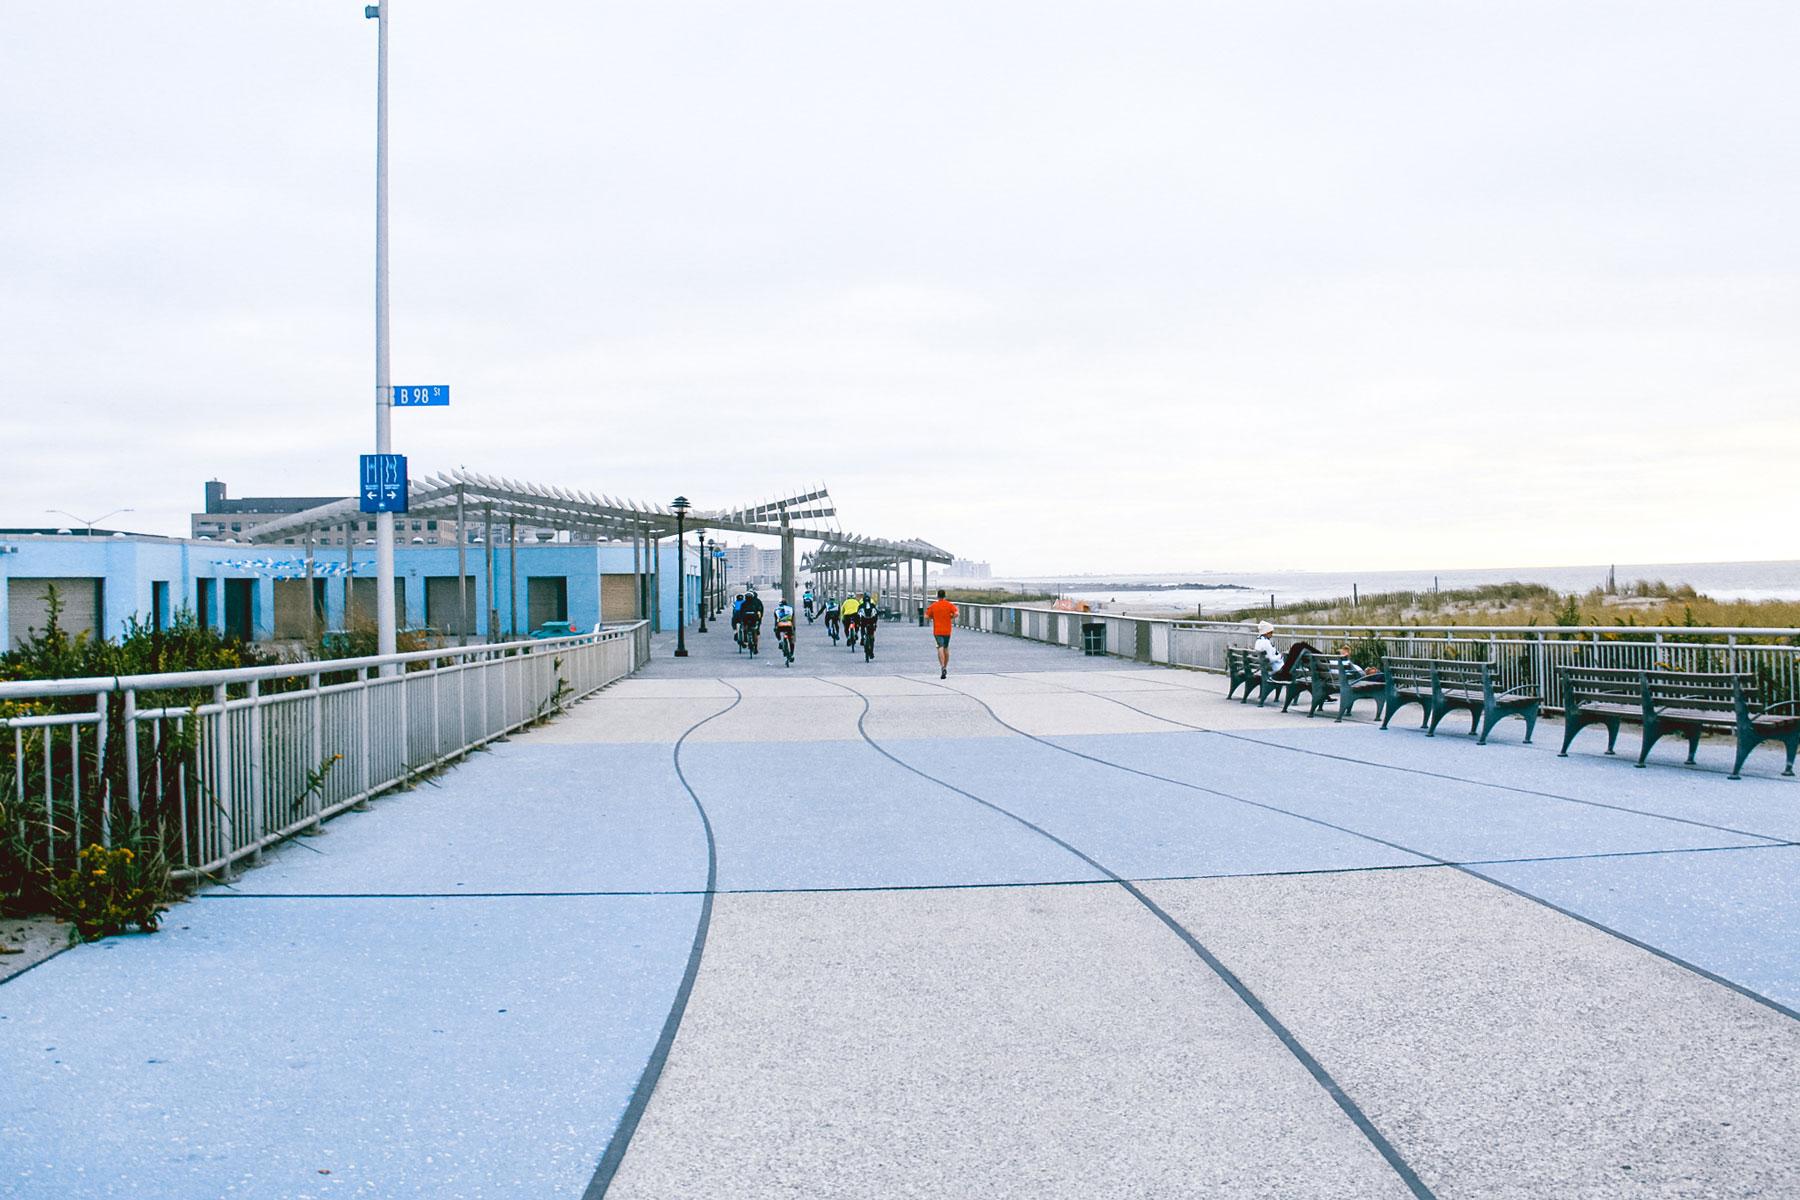 Boardwalk along a beach.